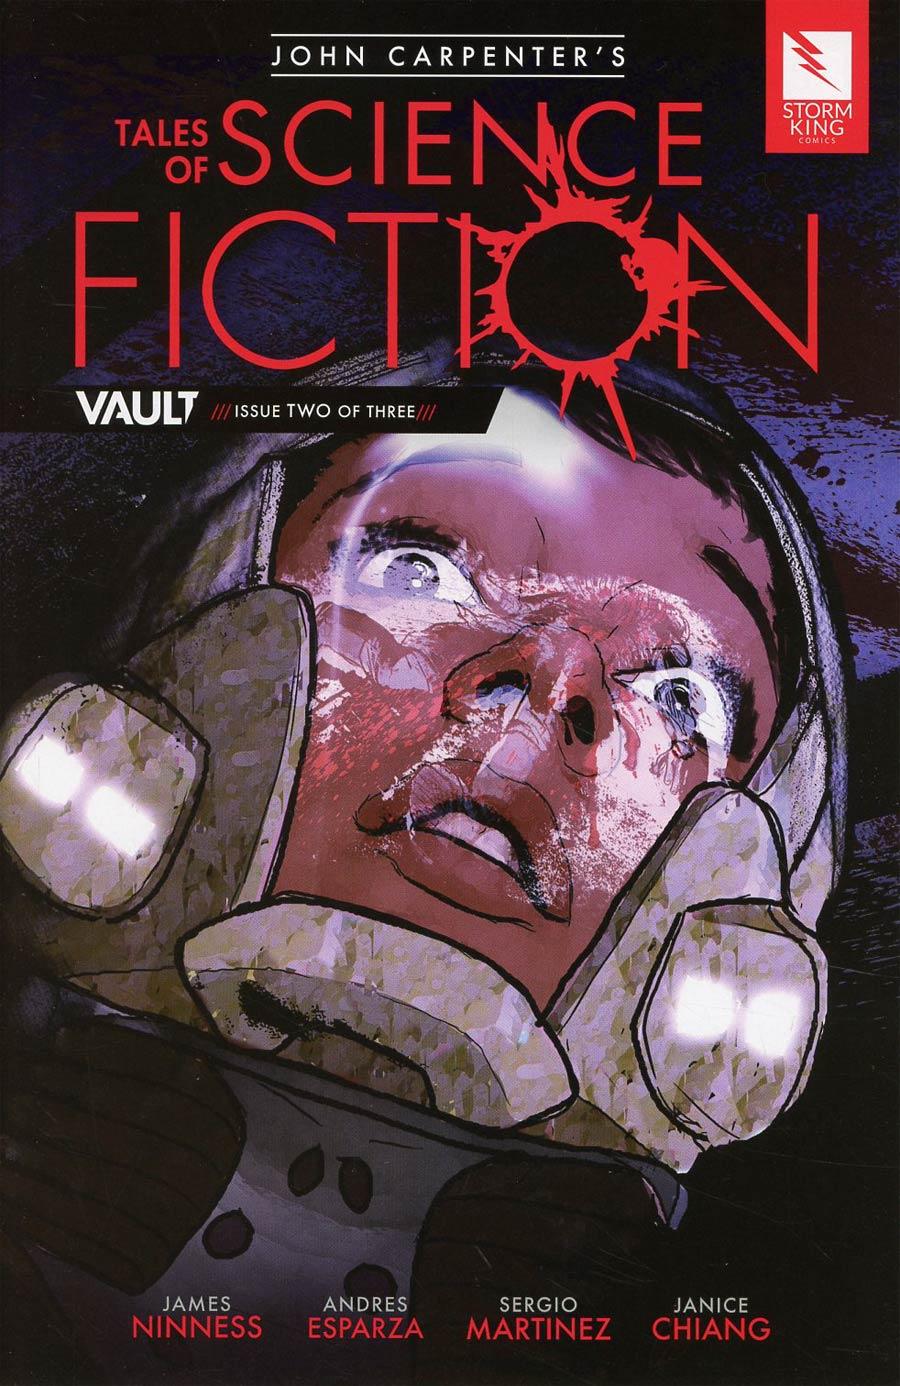 John Carpenters Tales Of Science Fiction Vault #2